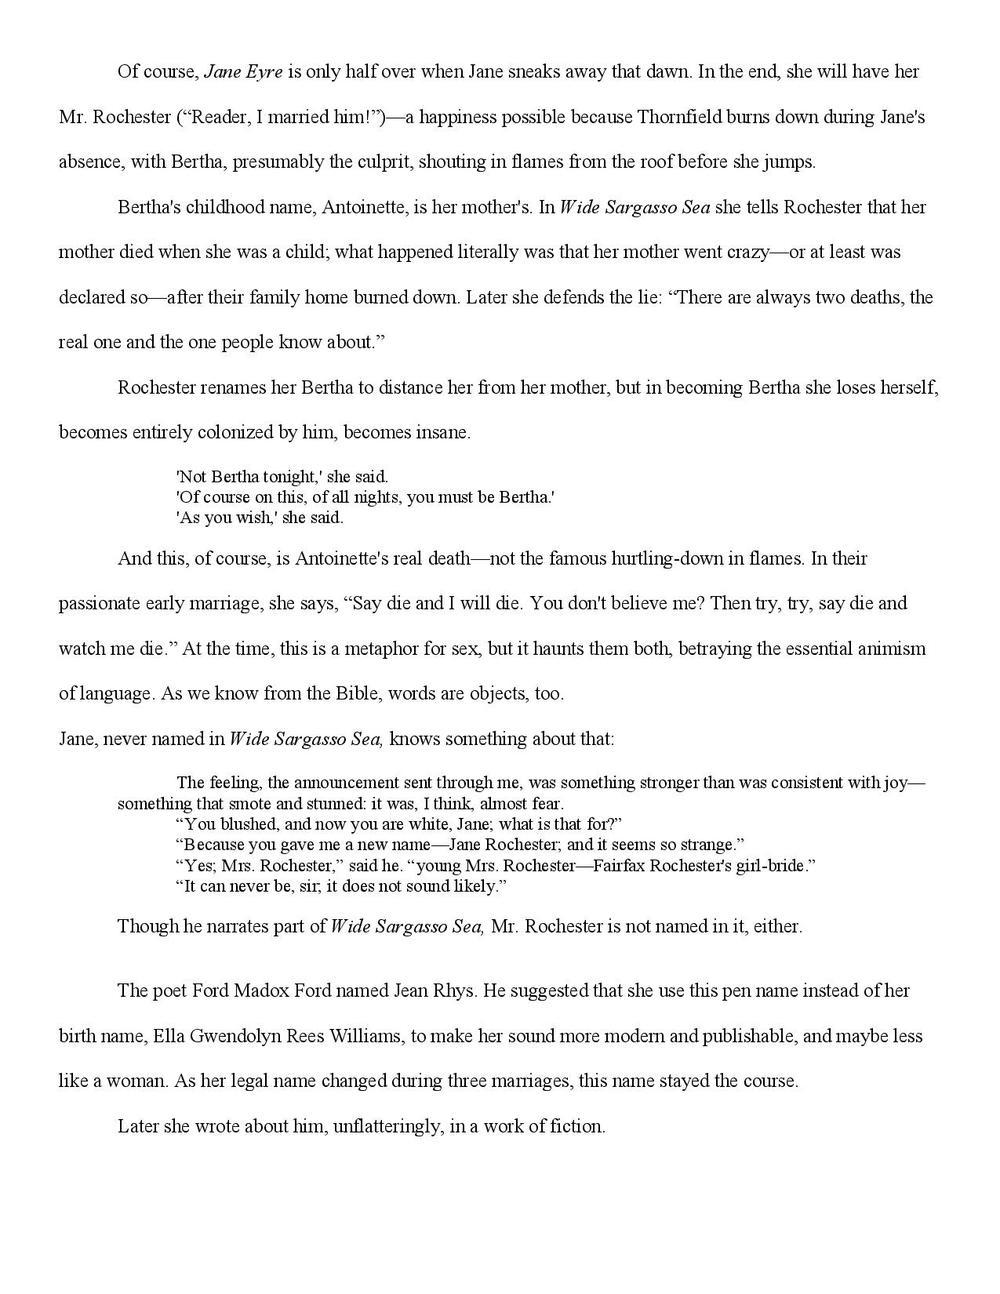 Timeline-page-015.jpg